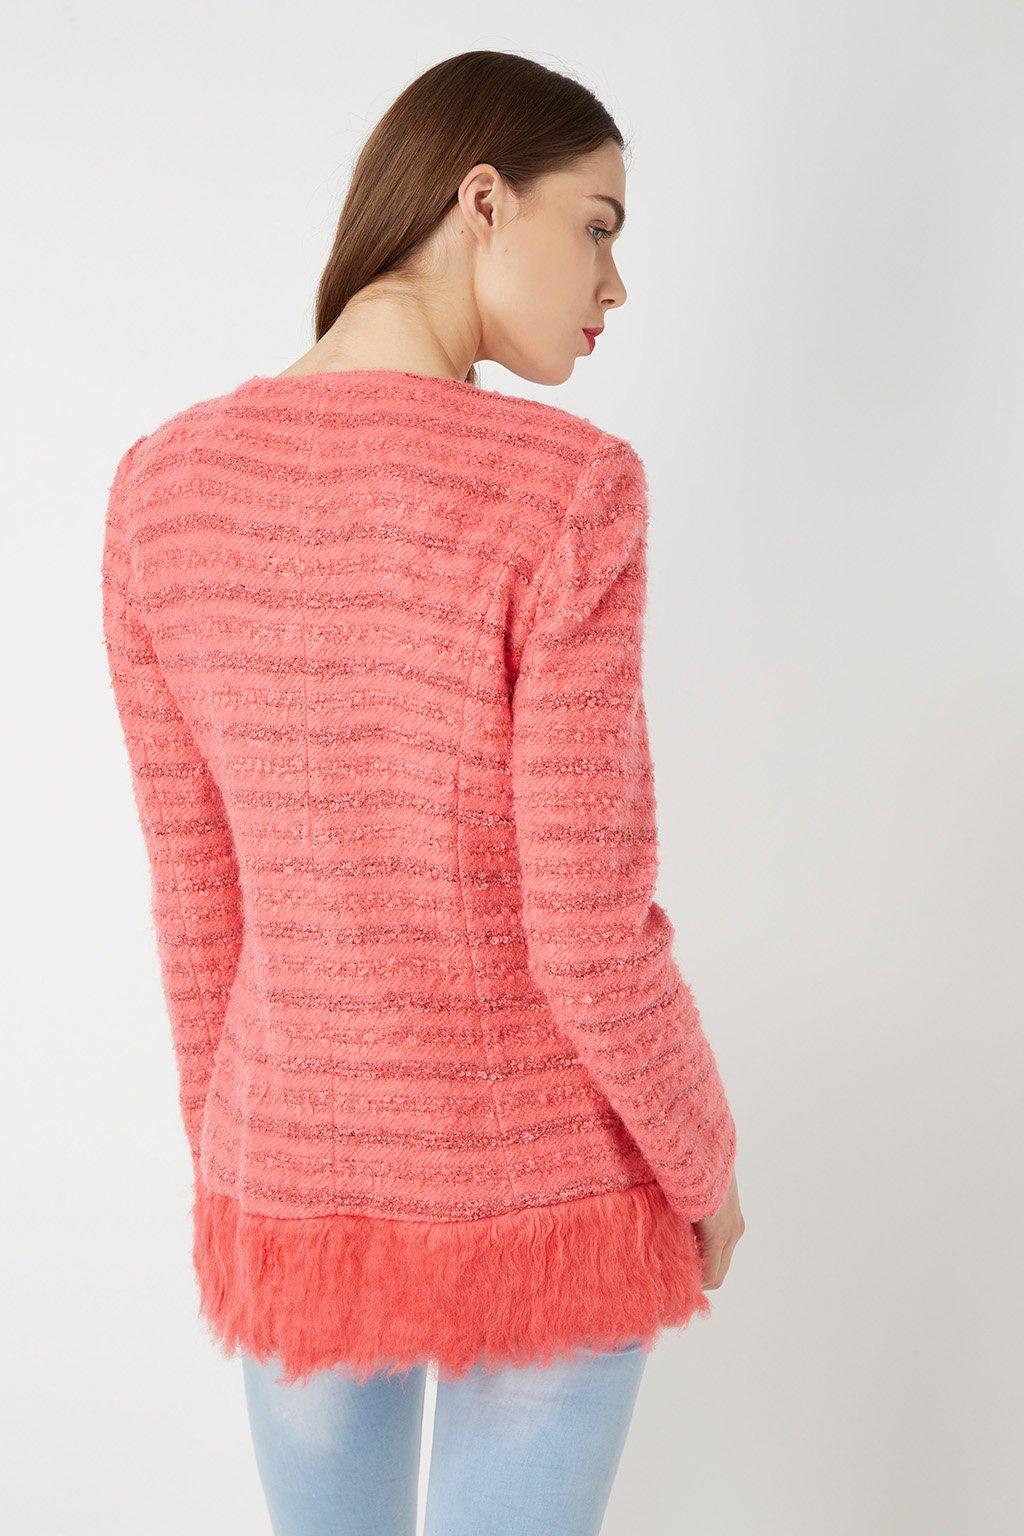 Abrigo de lana - Tutto Tempo